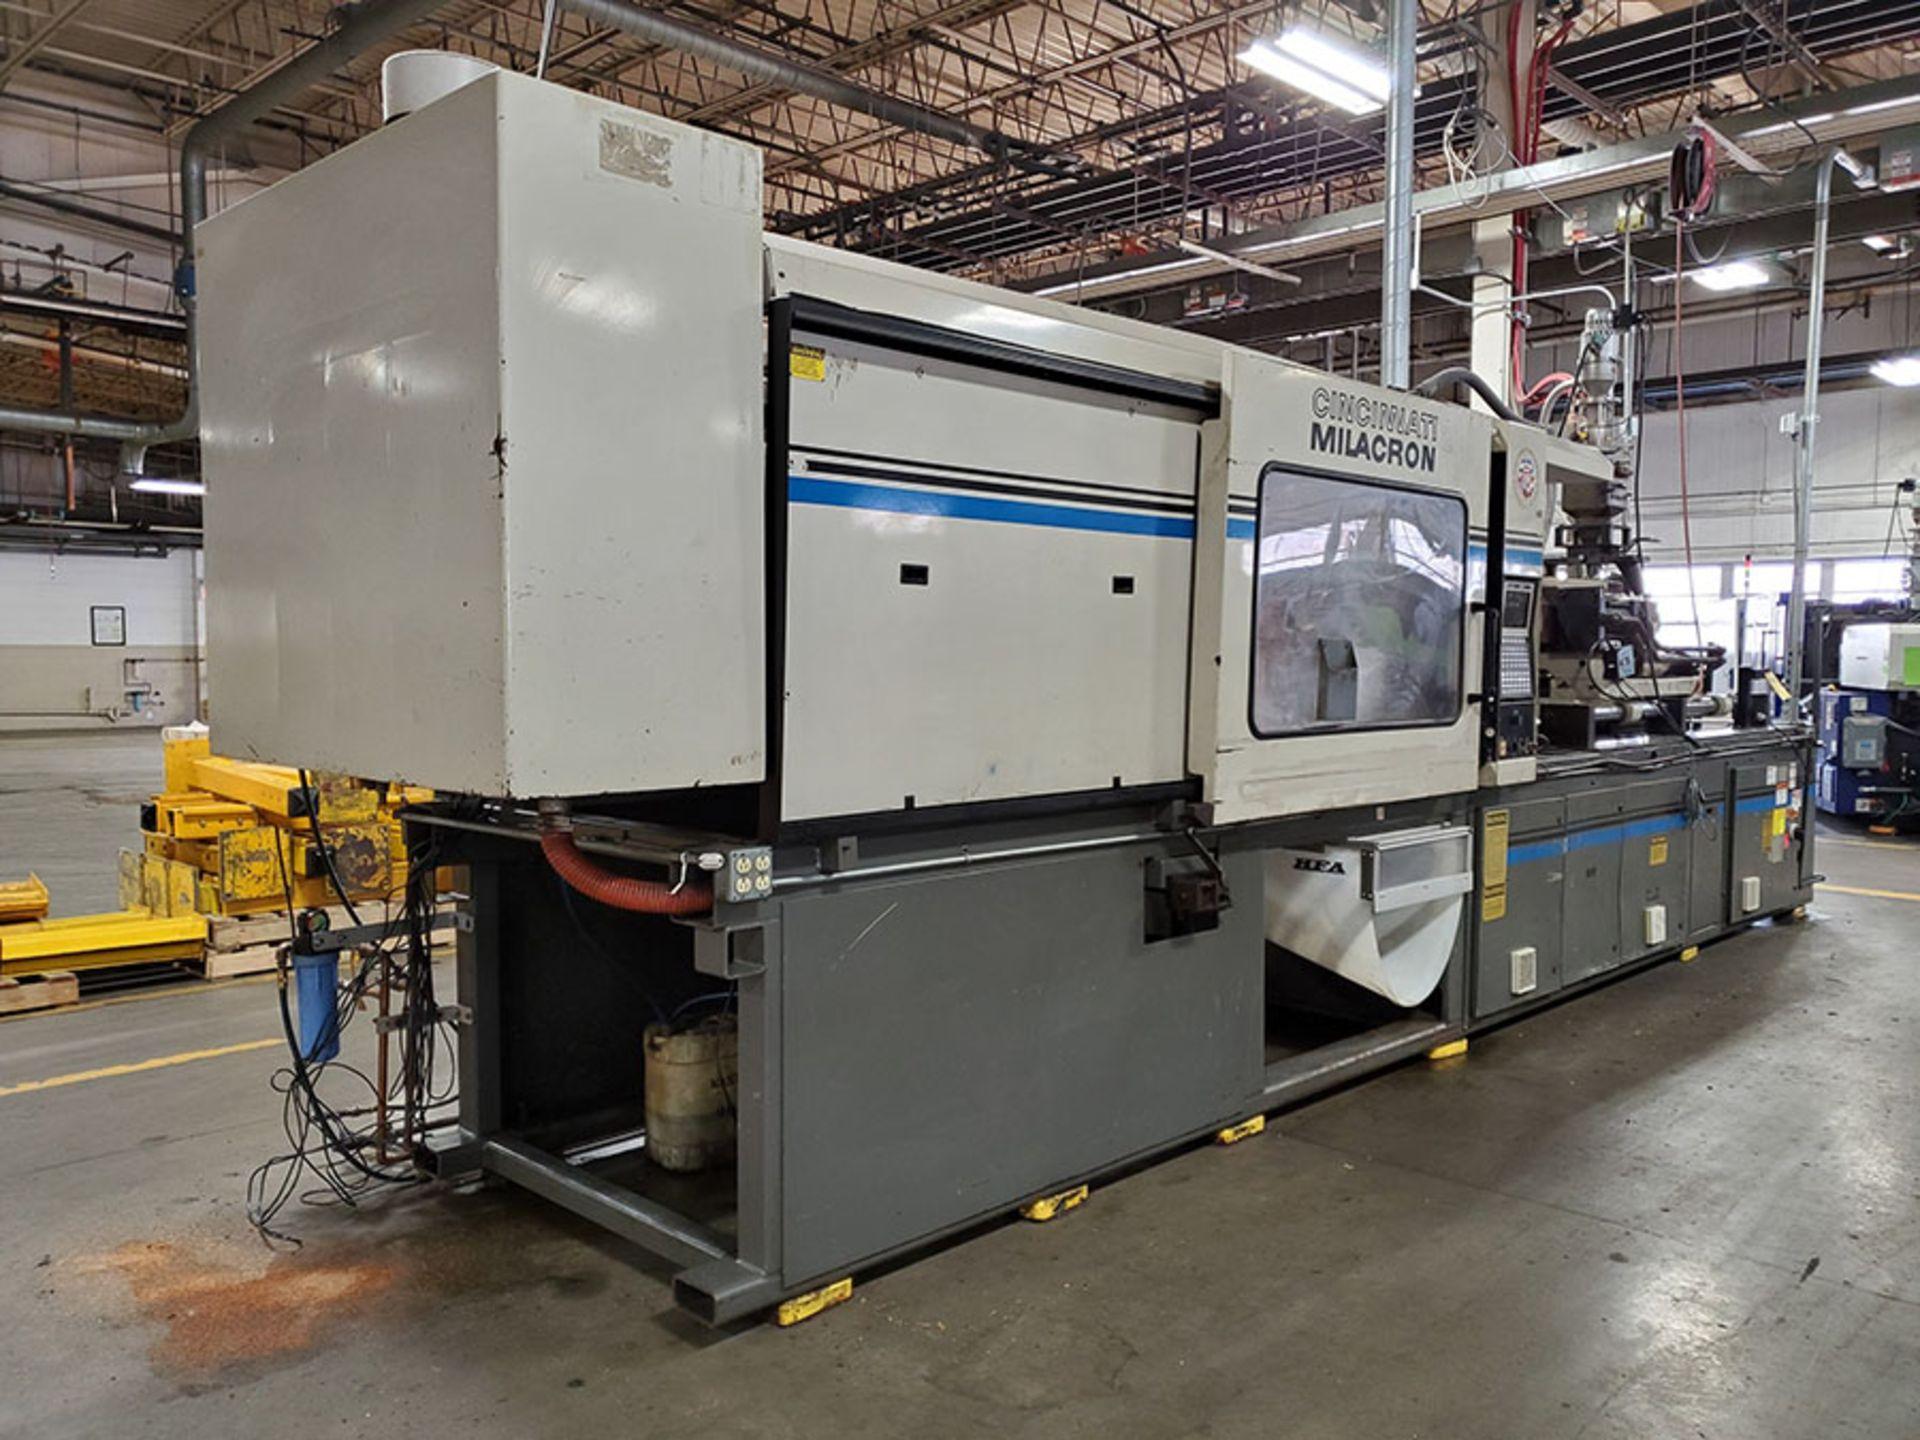 Lot 167 - 1994 CINCINNATI MILACRON 400-TON PLASTIC INJECTION MOLDING MACHINE; MODEL VH-400-29, S/N